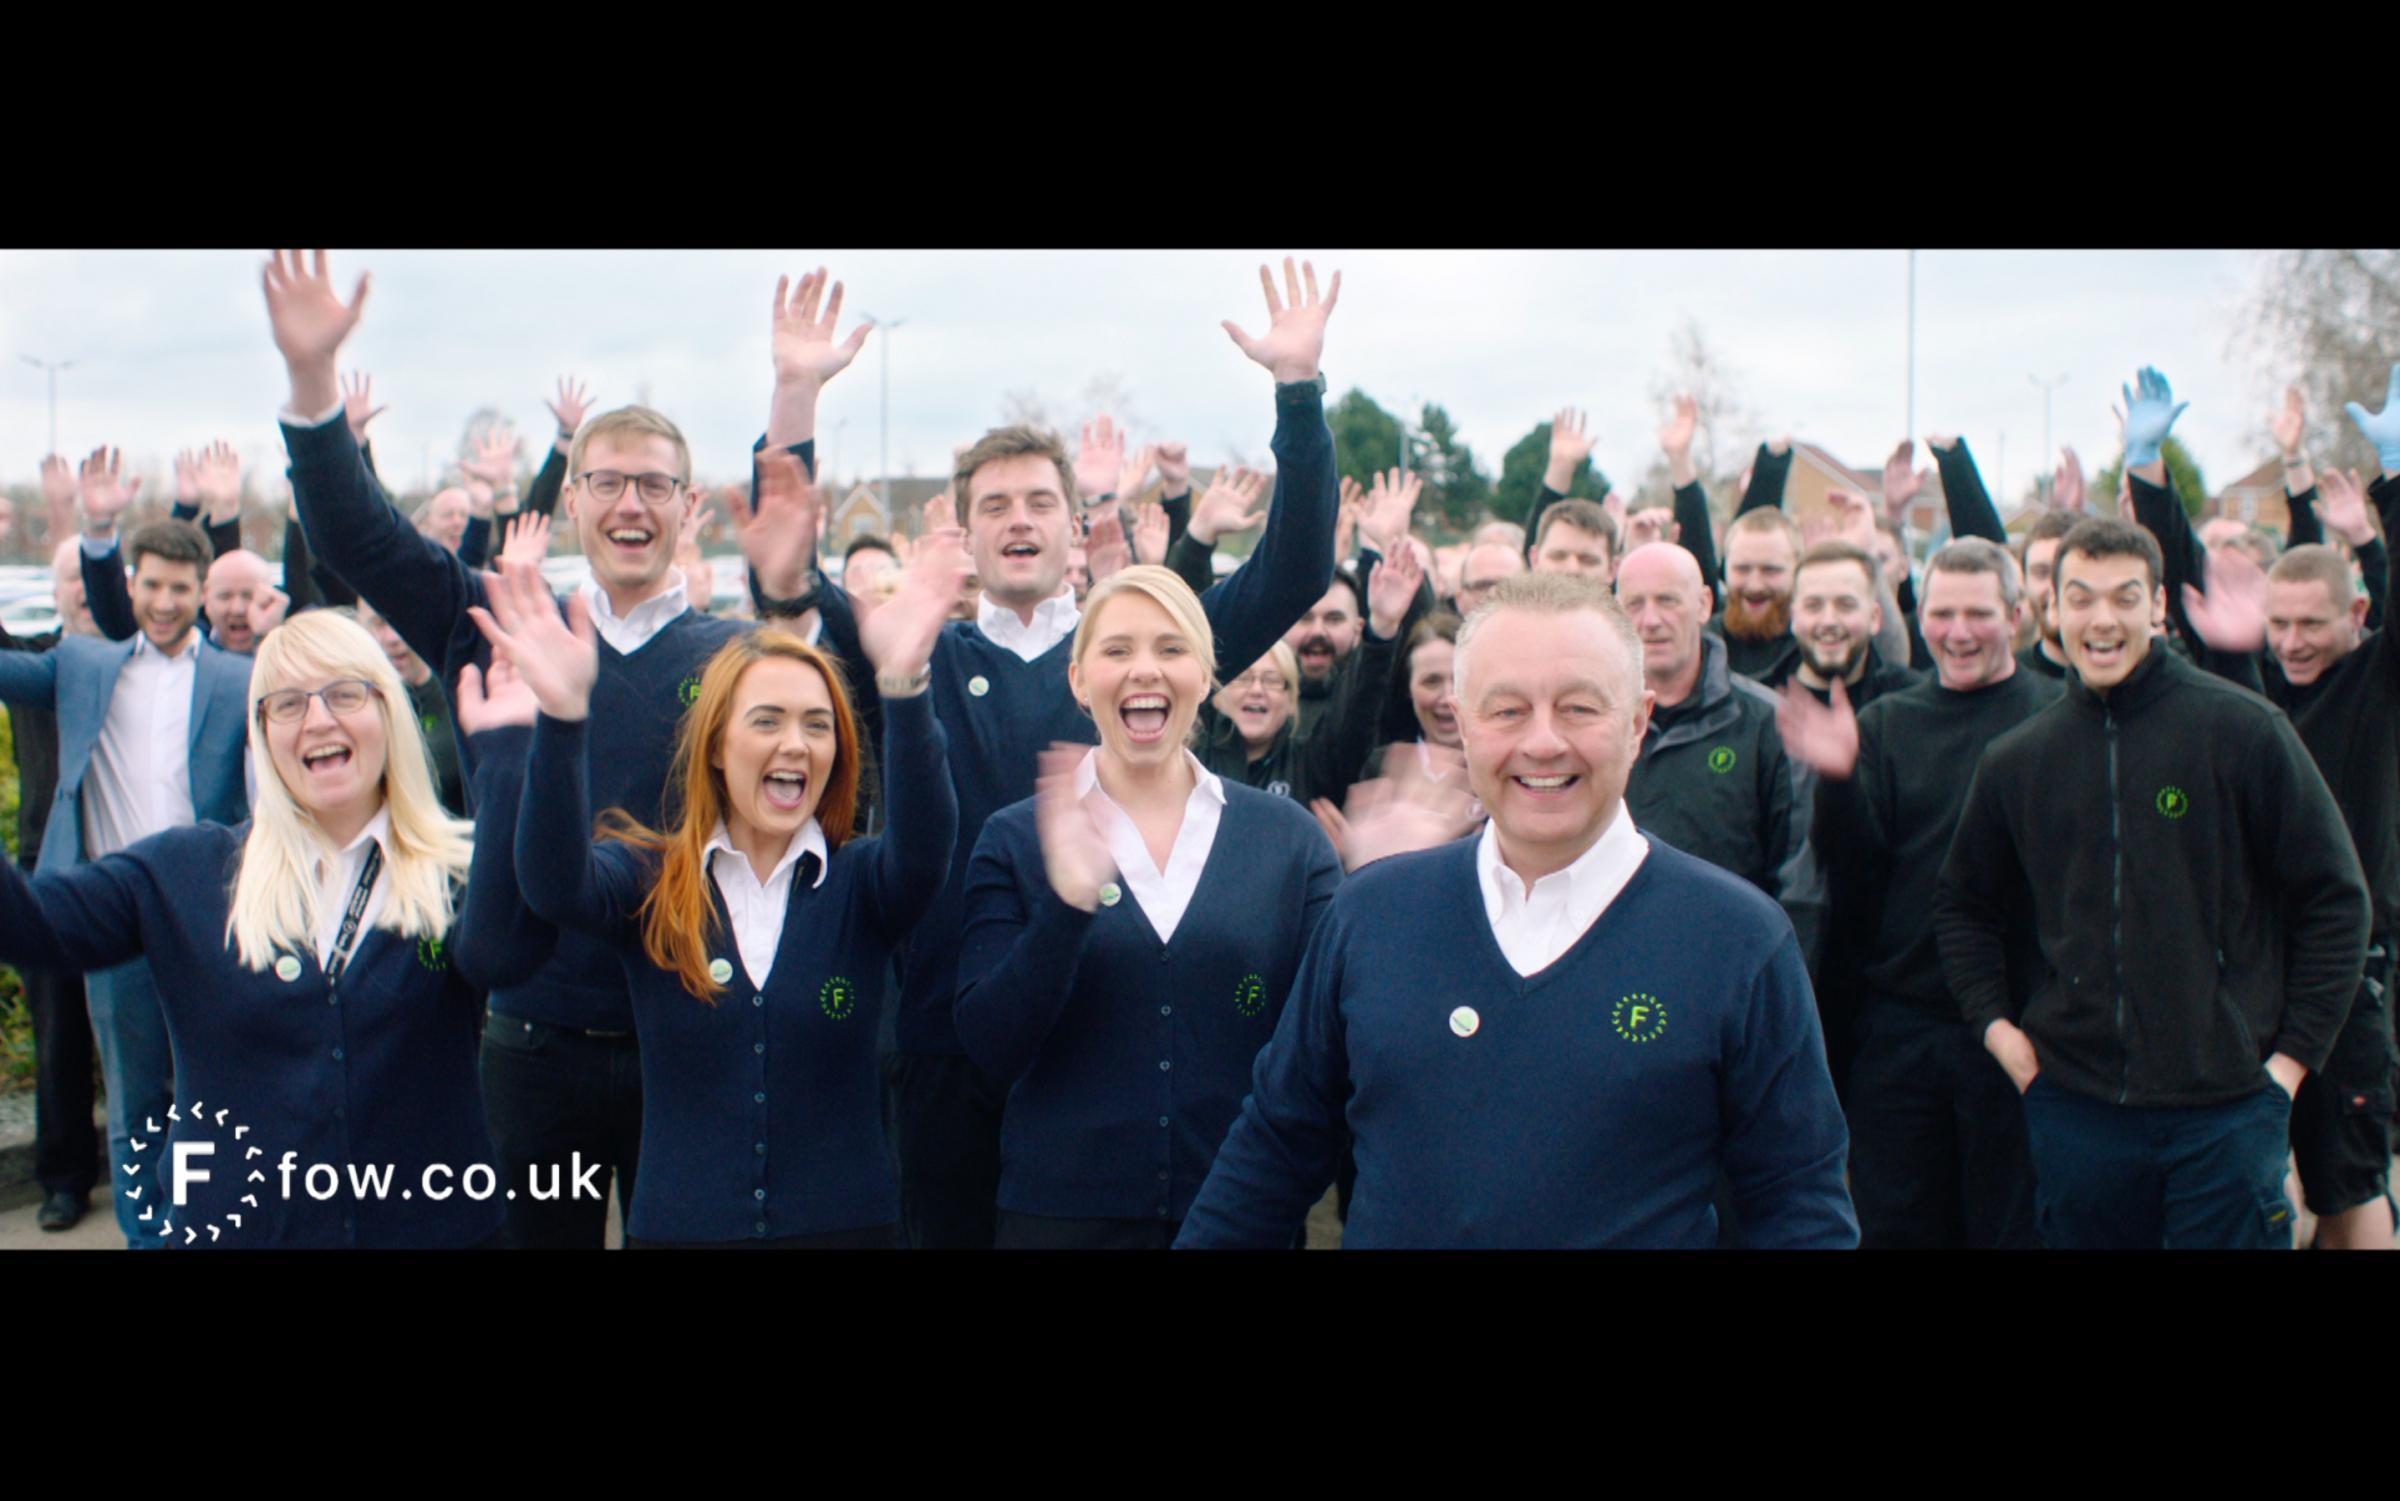 Trip down memory lane as car dealership marks milestone